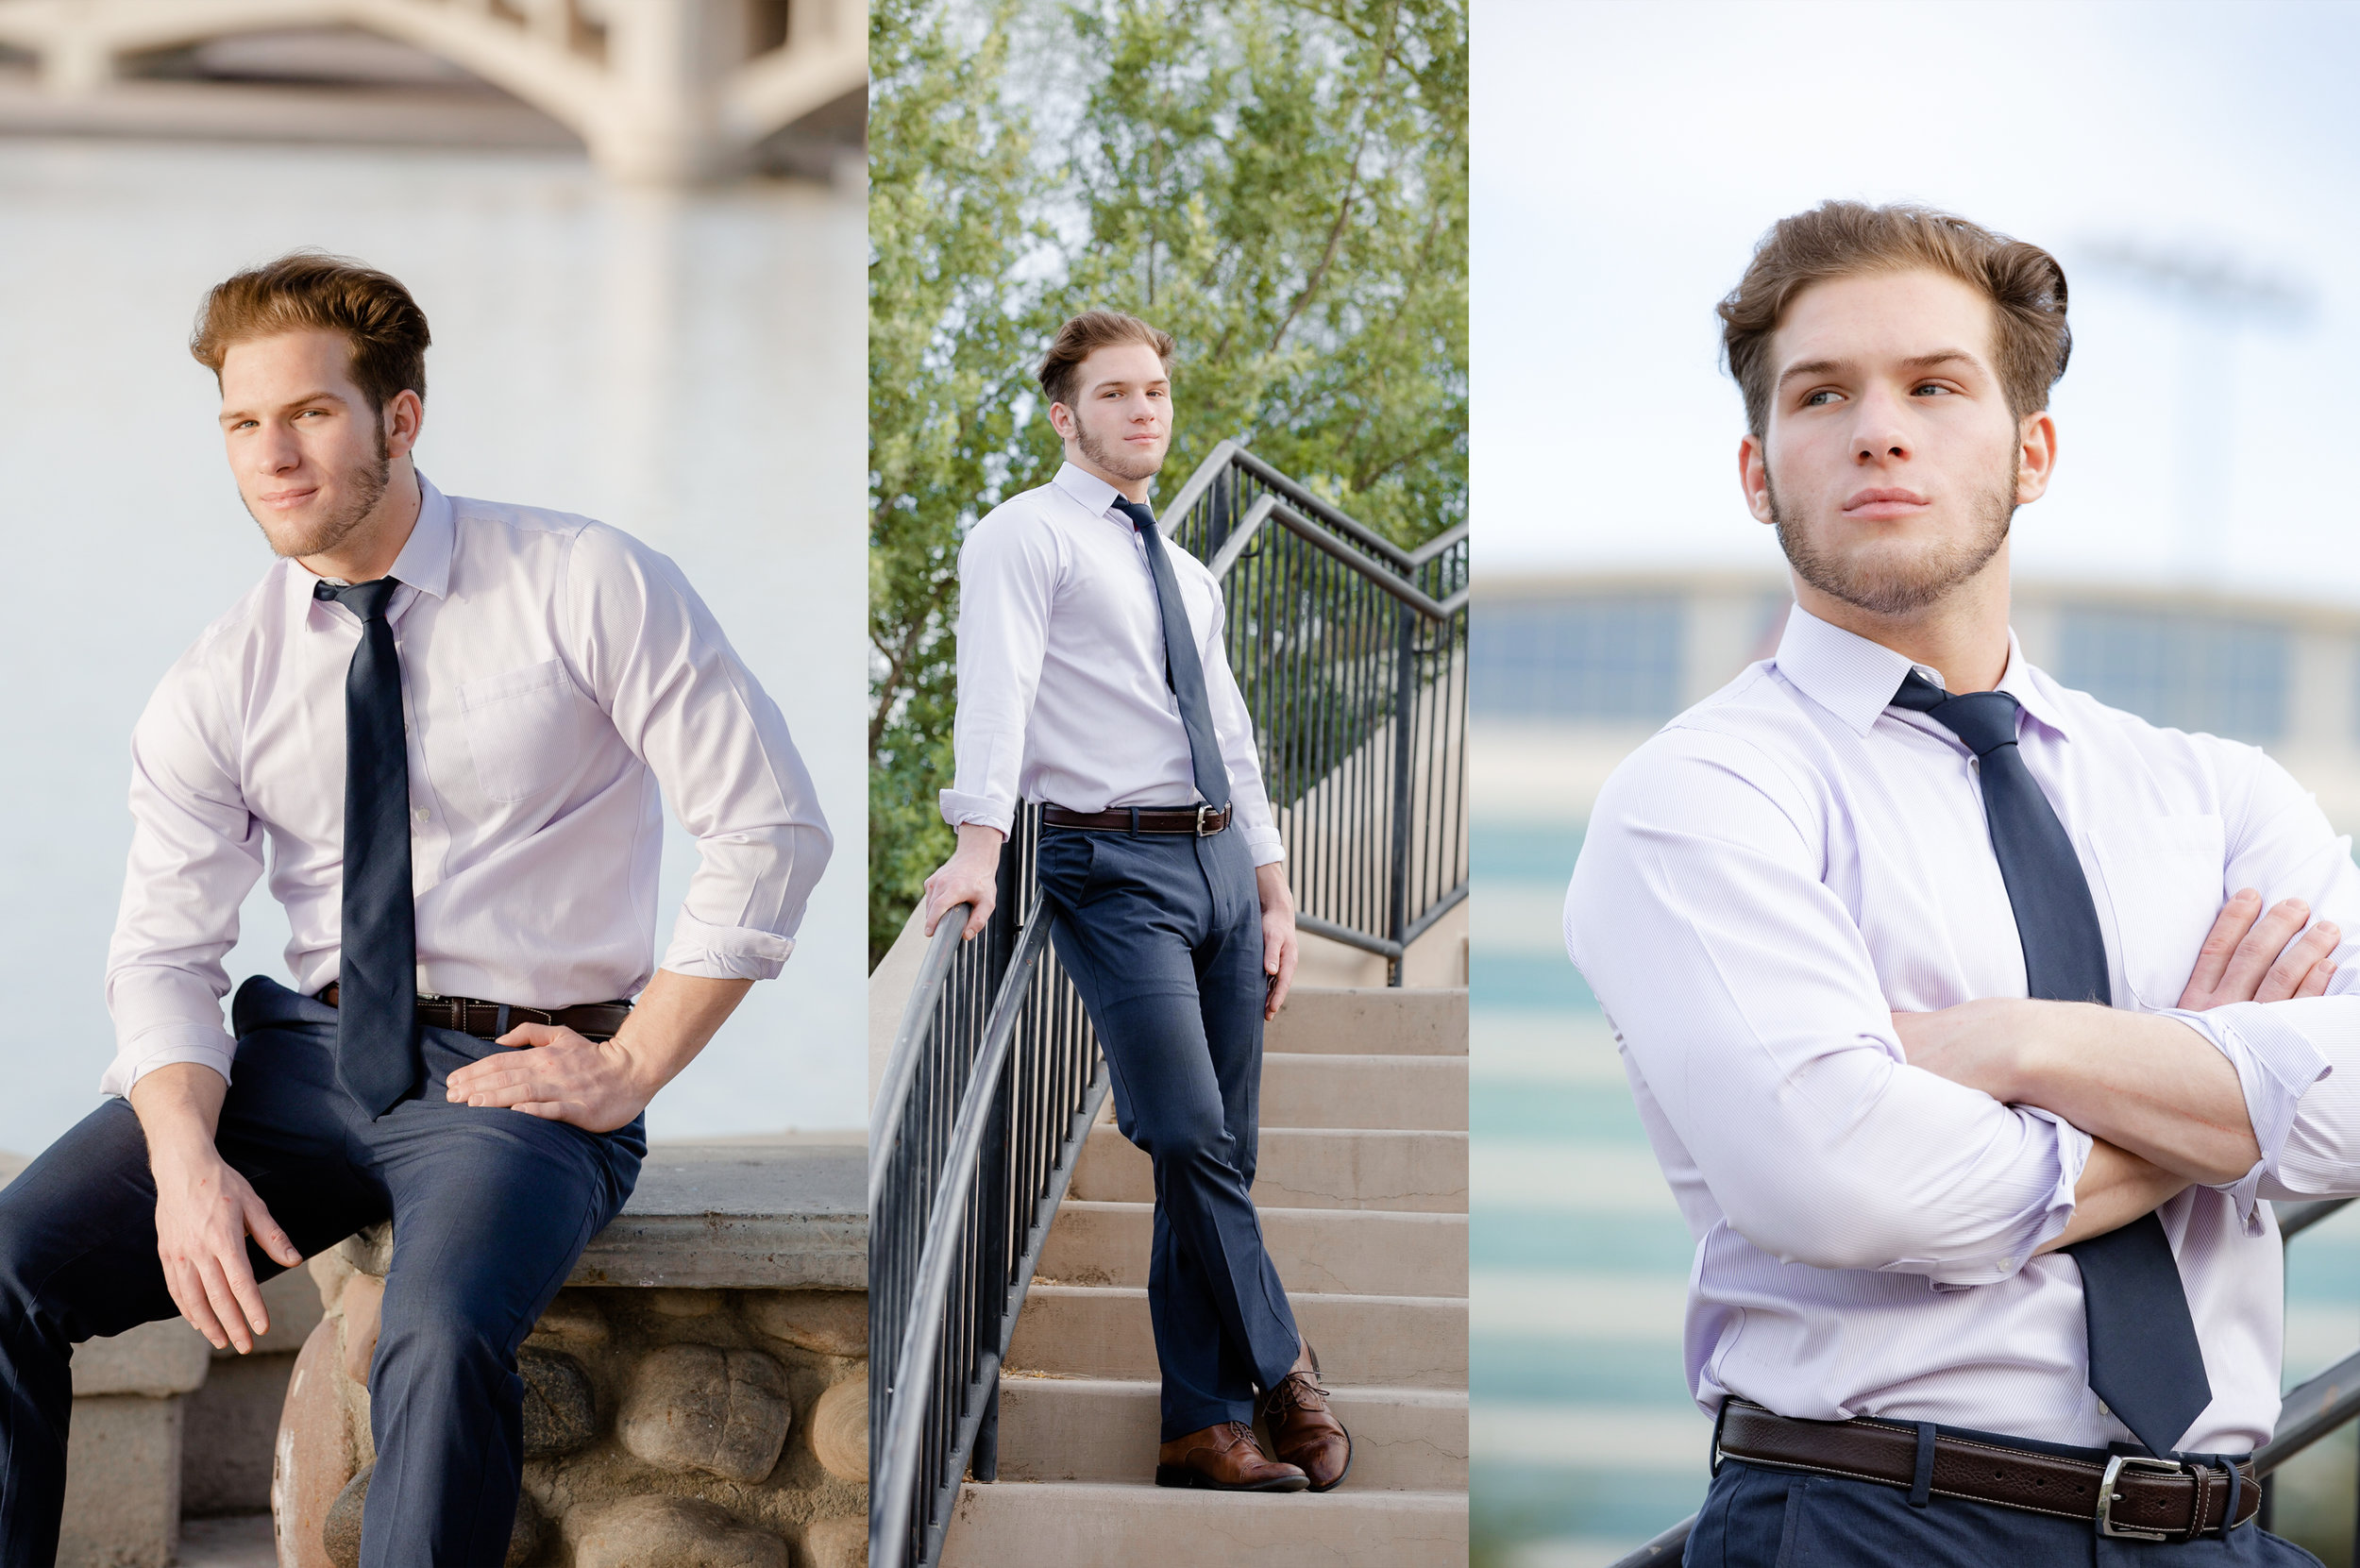 David-Orr-Photography_Senior-Portraits.jpg